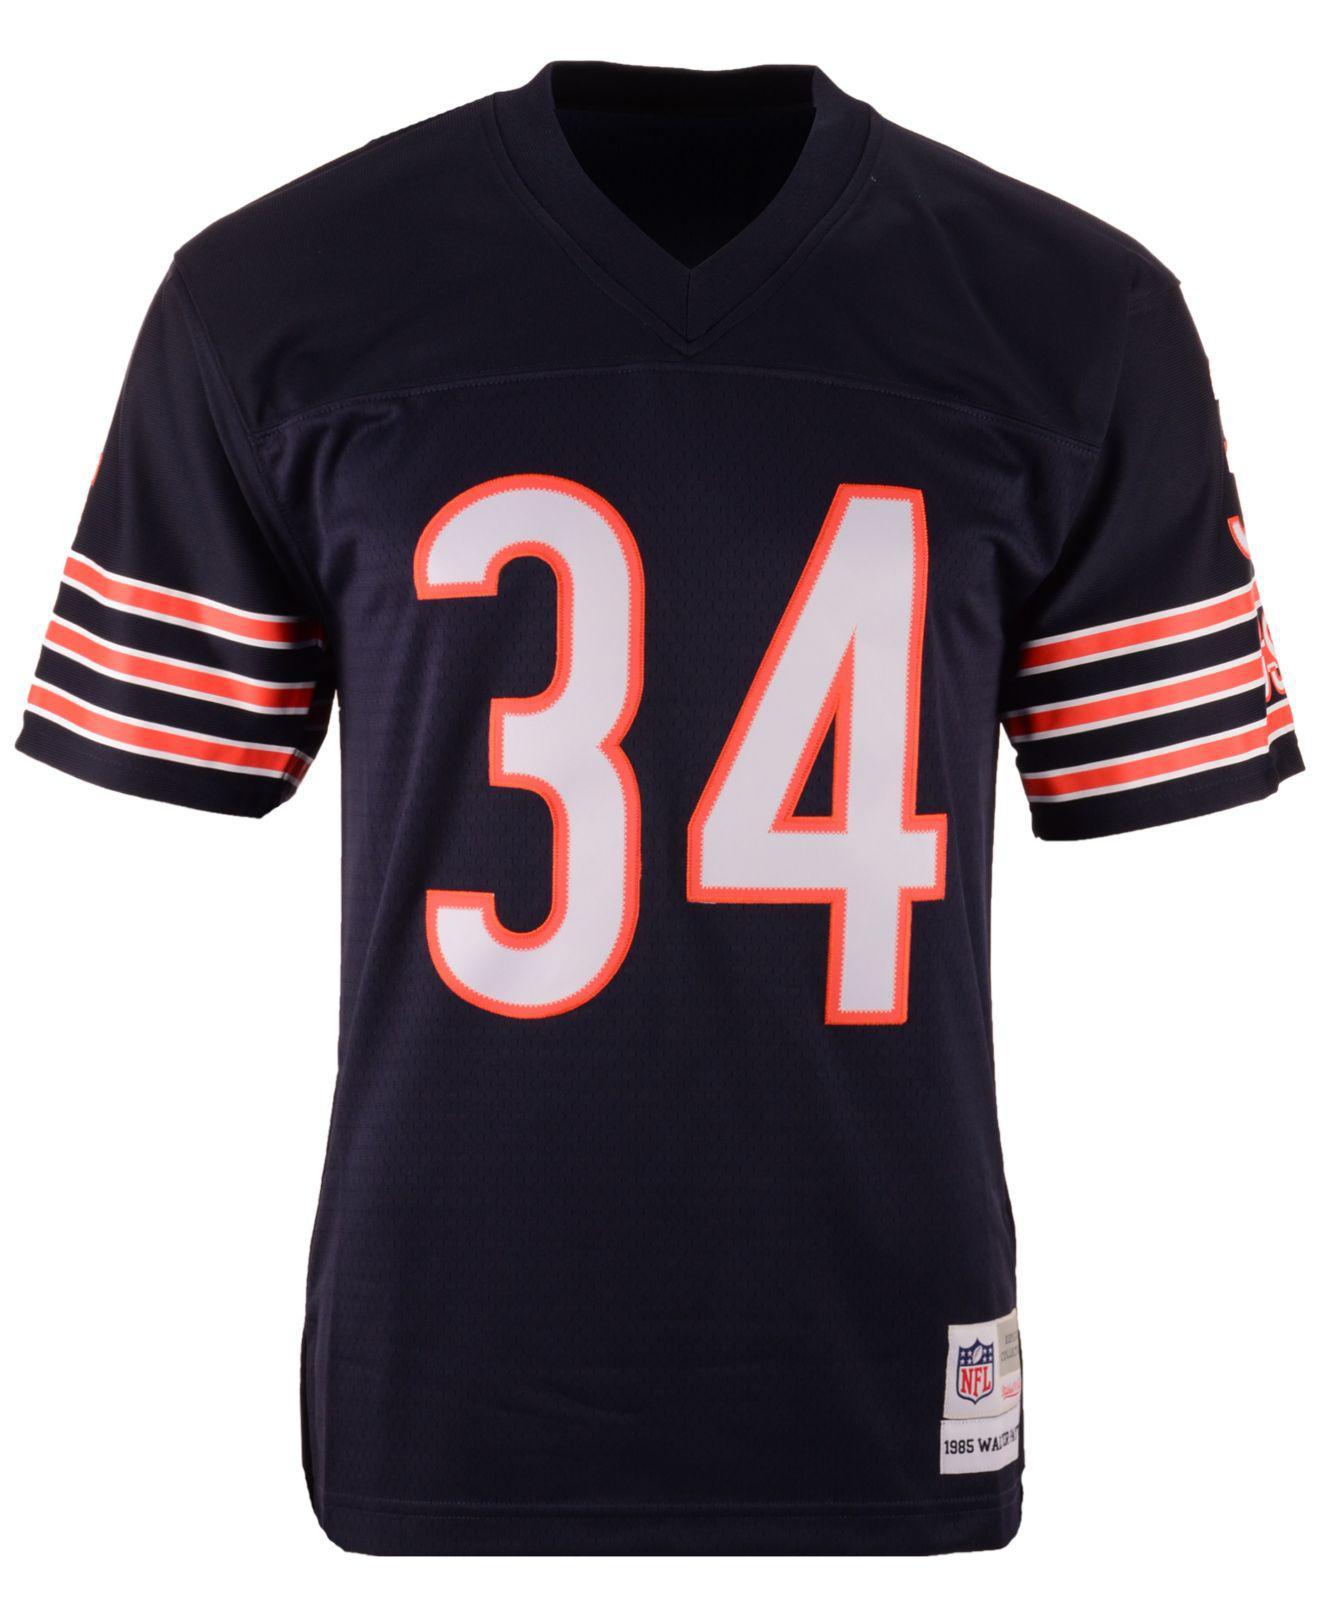 watch c5a4d 9093a Blue Men's Walter Payton Chicago Bears Replica Throwback Jersey